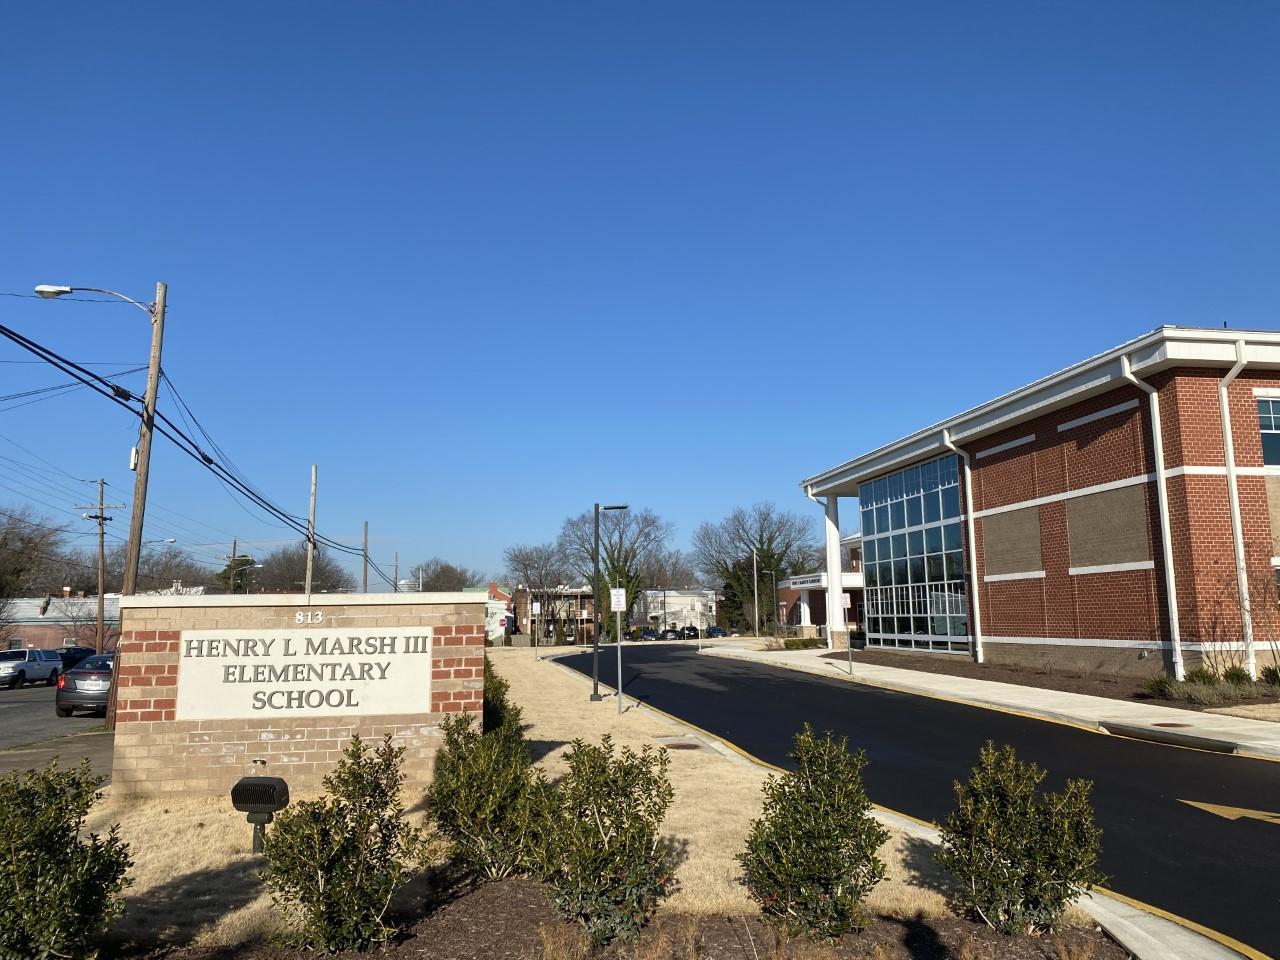 Henry L. Marsh, III Elementary School exterior